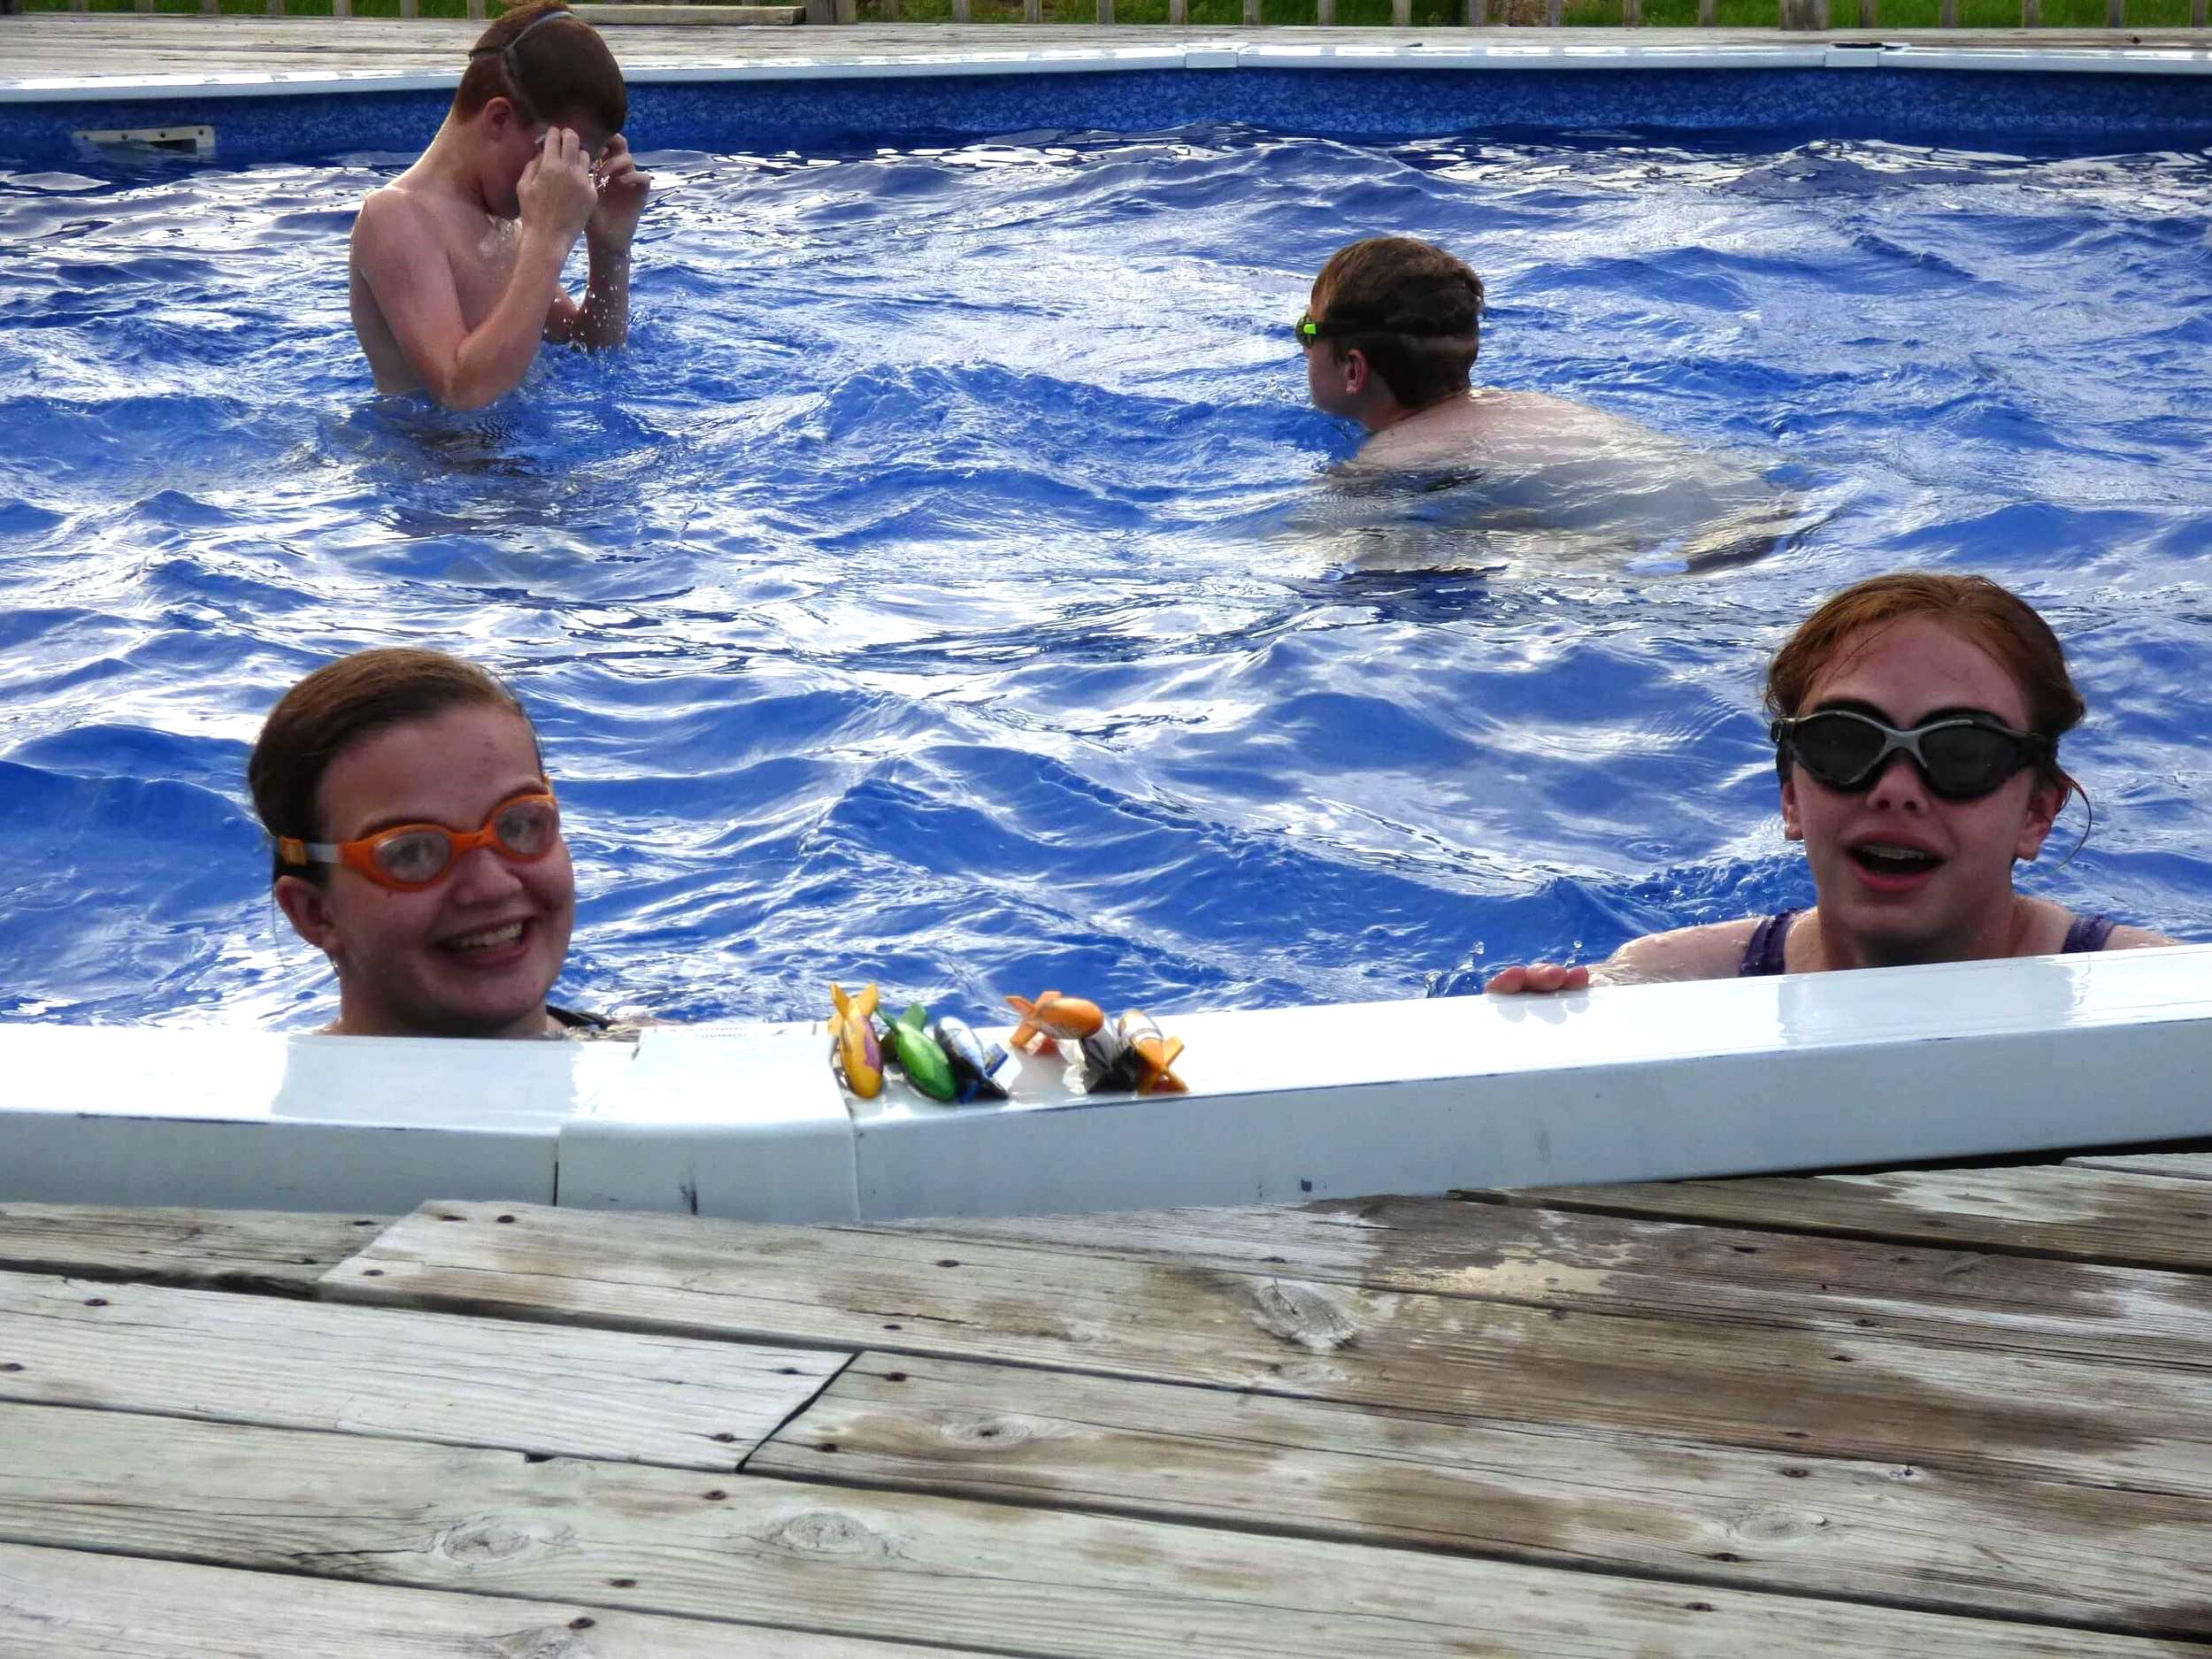 summer fun at the pool